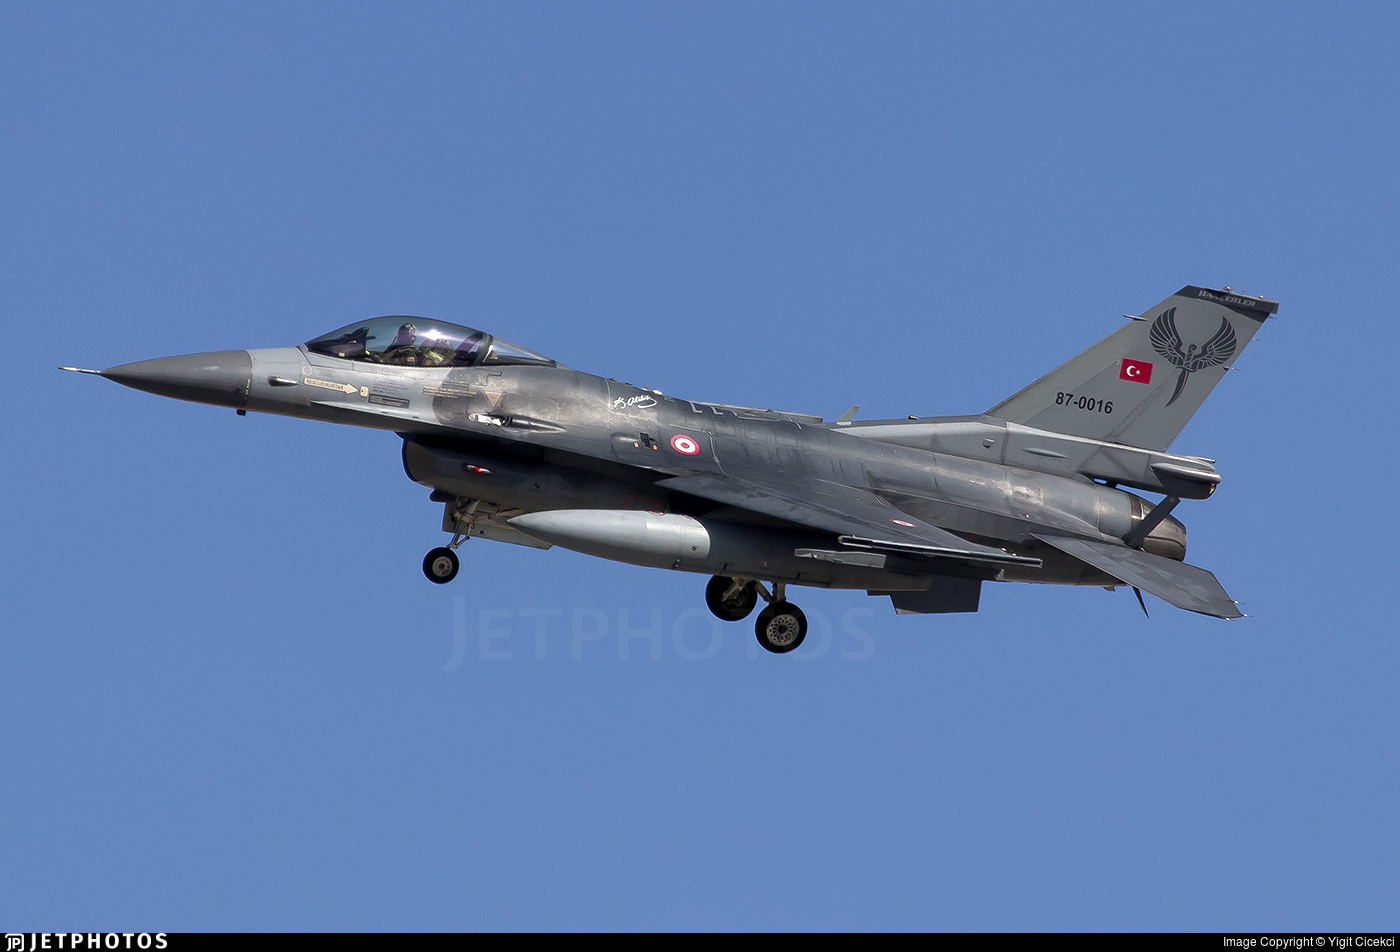 87-0016 - Lockheed Martin F-16C Fighting Falcon - Turkey - Air Force